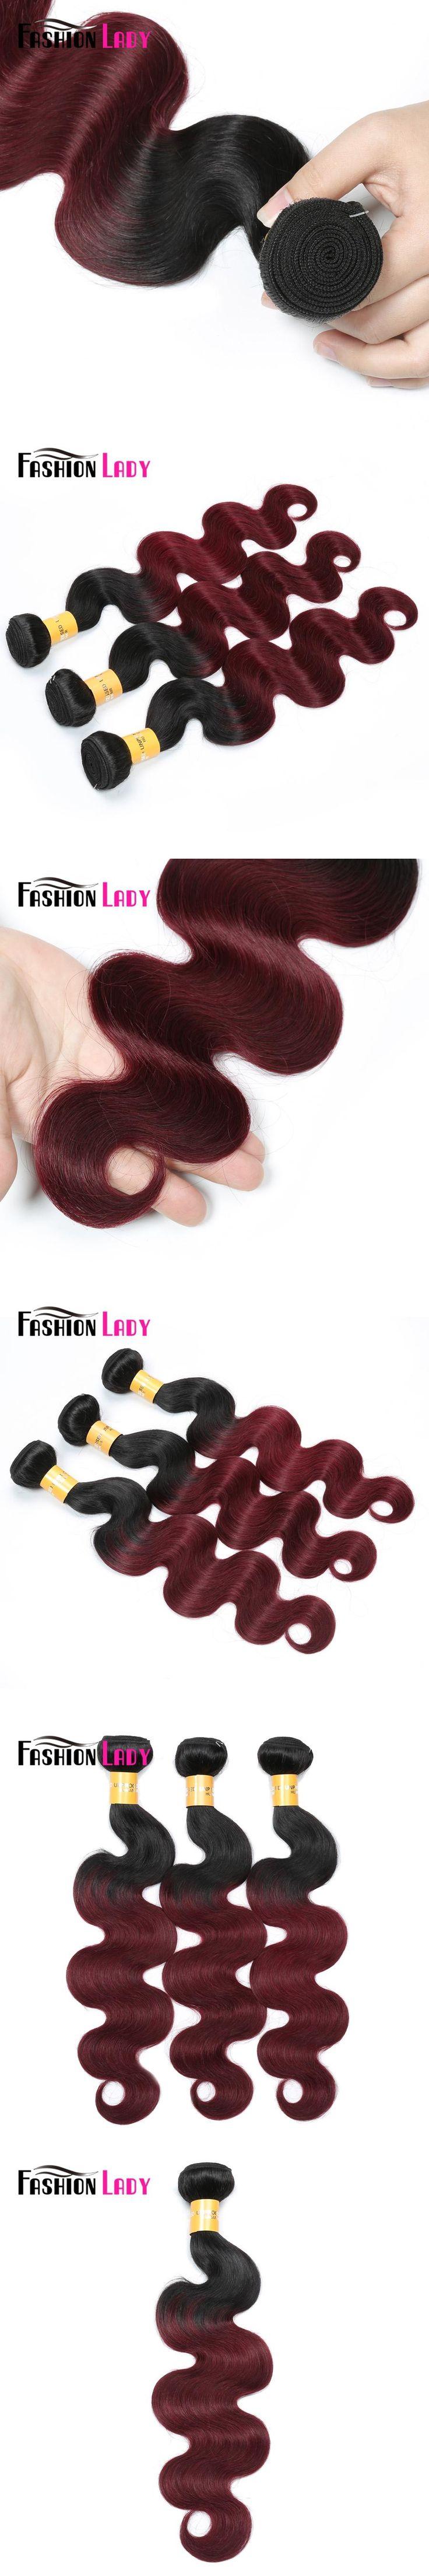 Fashion Lady Pre-Colored Brazilian Body Wave Hair 3 Bundles 1b/99j Ombre Human Hair Extensions 100% Human Hair Non-remy